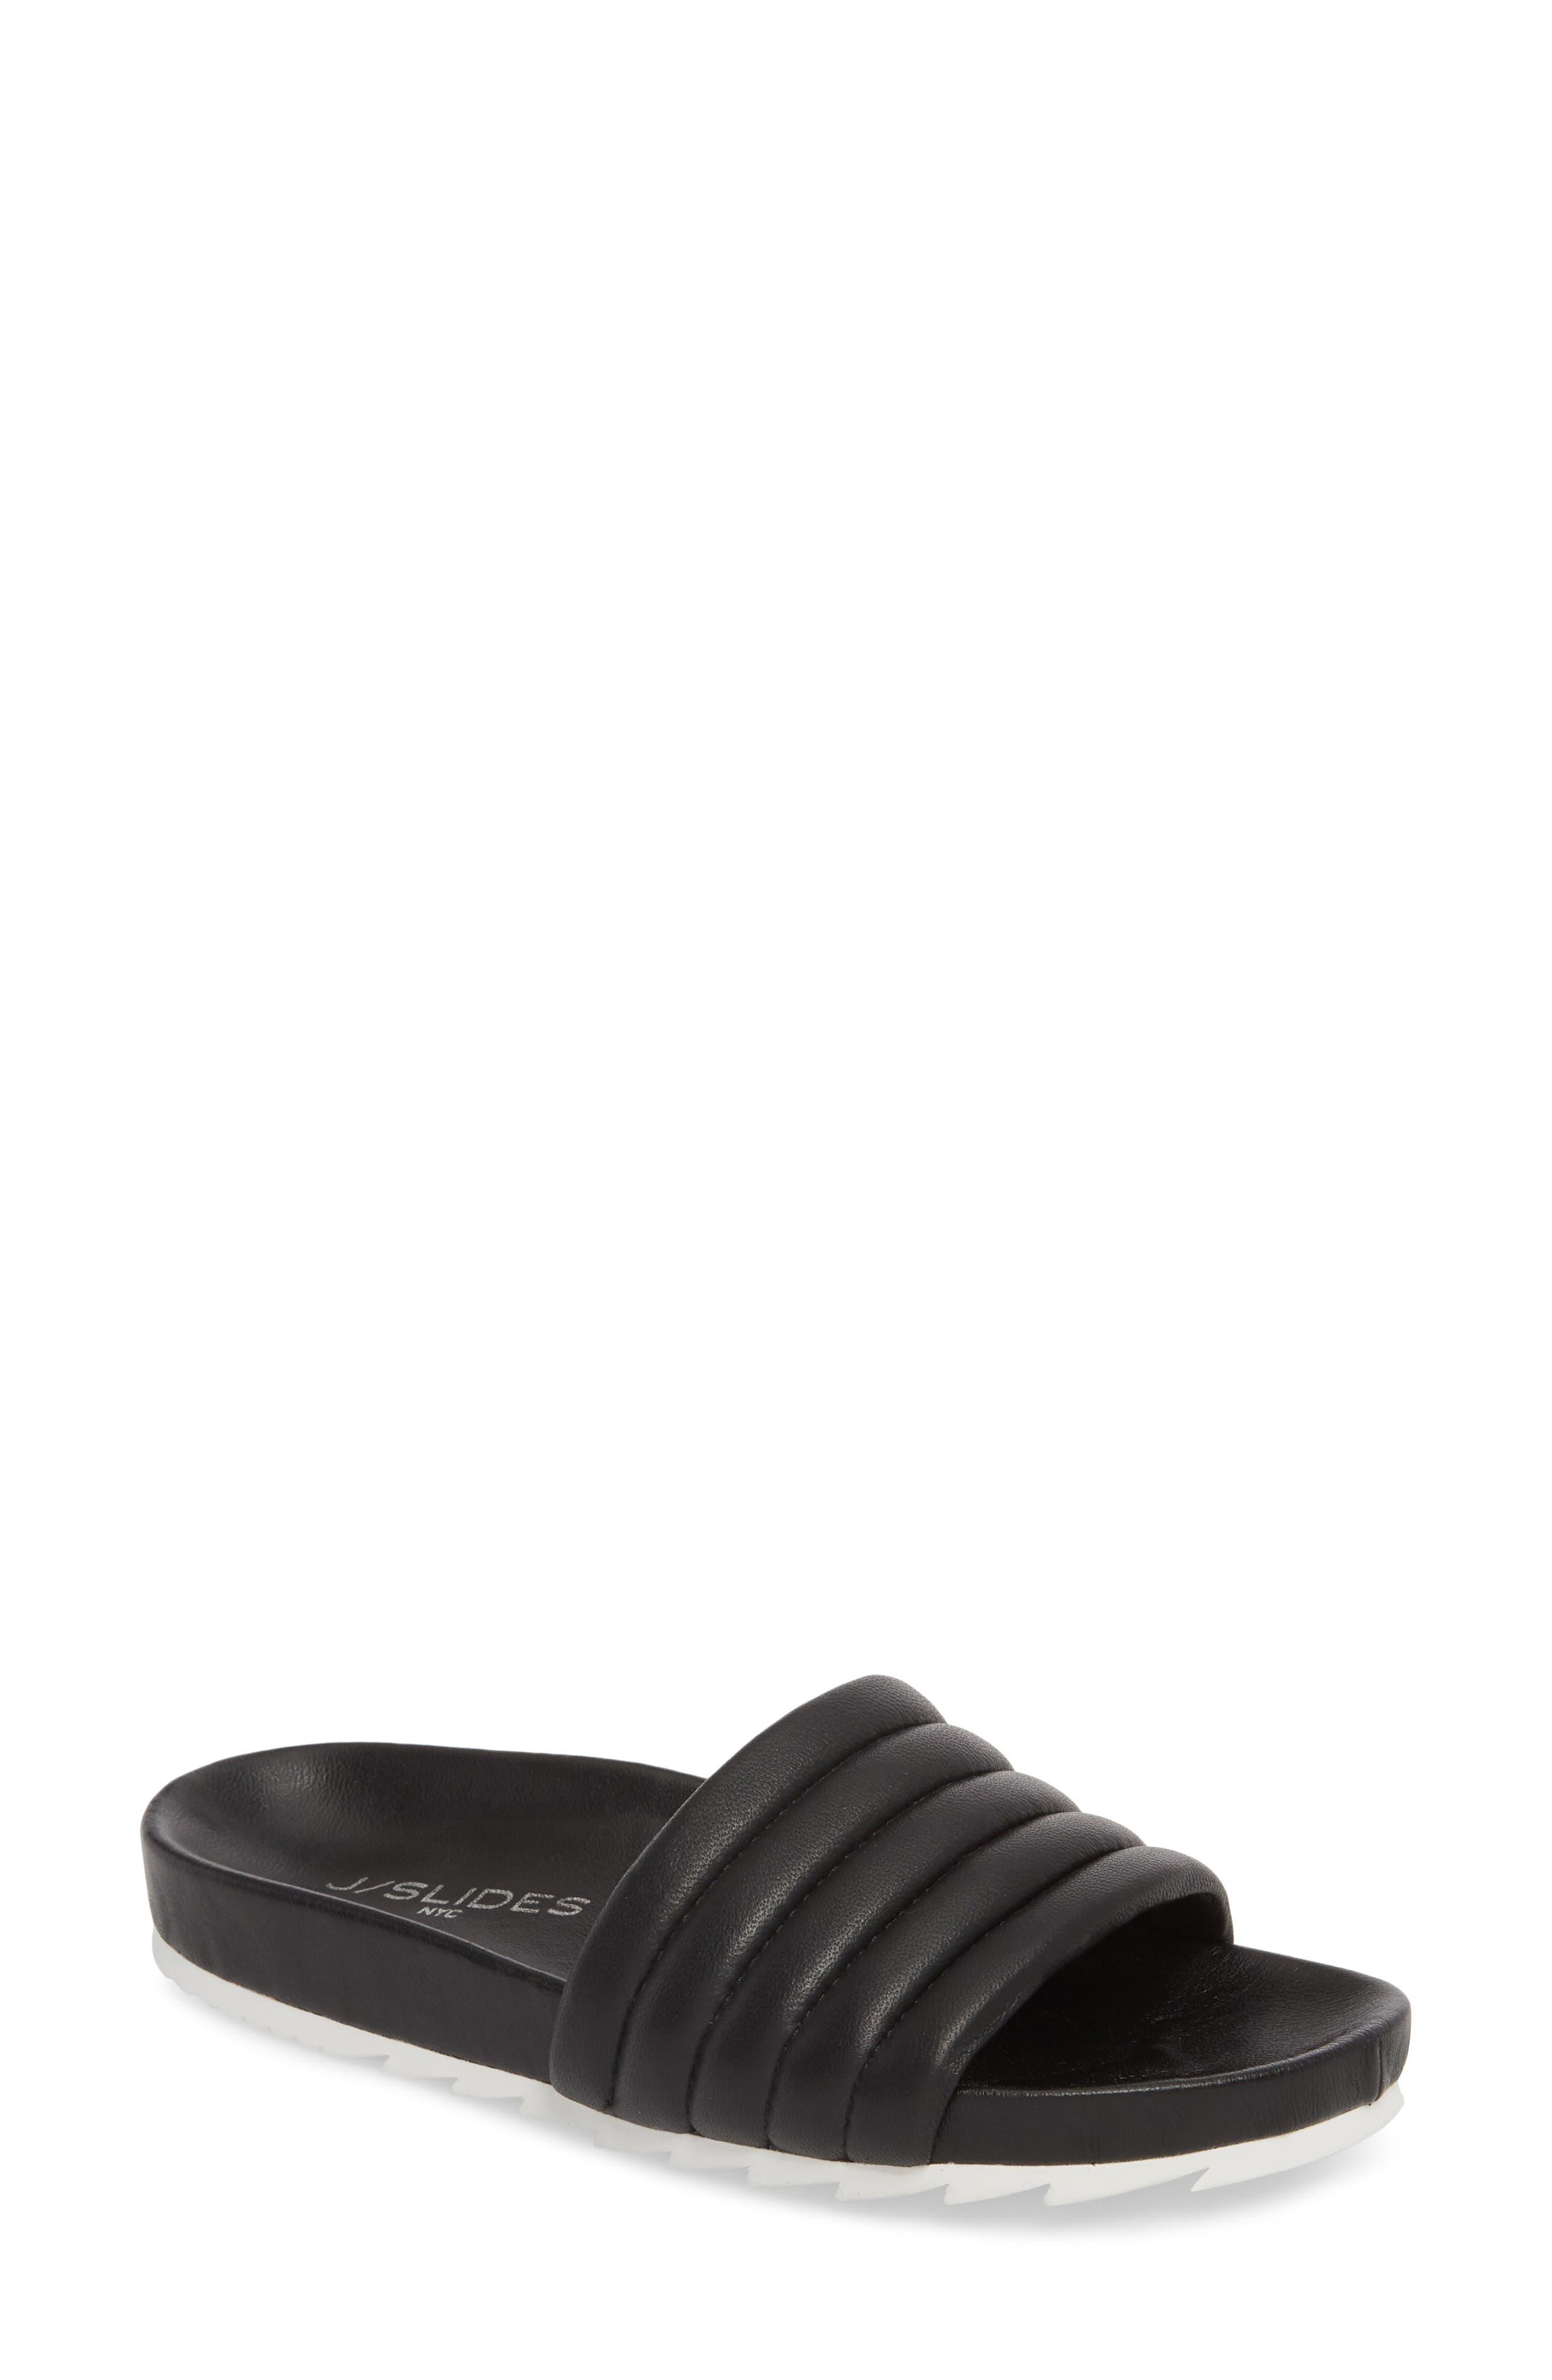 Eppie Slide Sandal,                             Main thumbnail 1, color,                             BLACK LEATHER